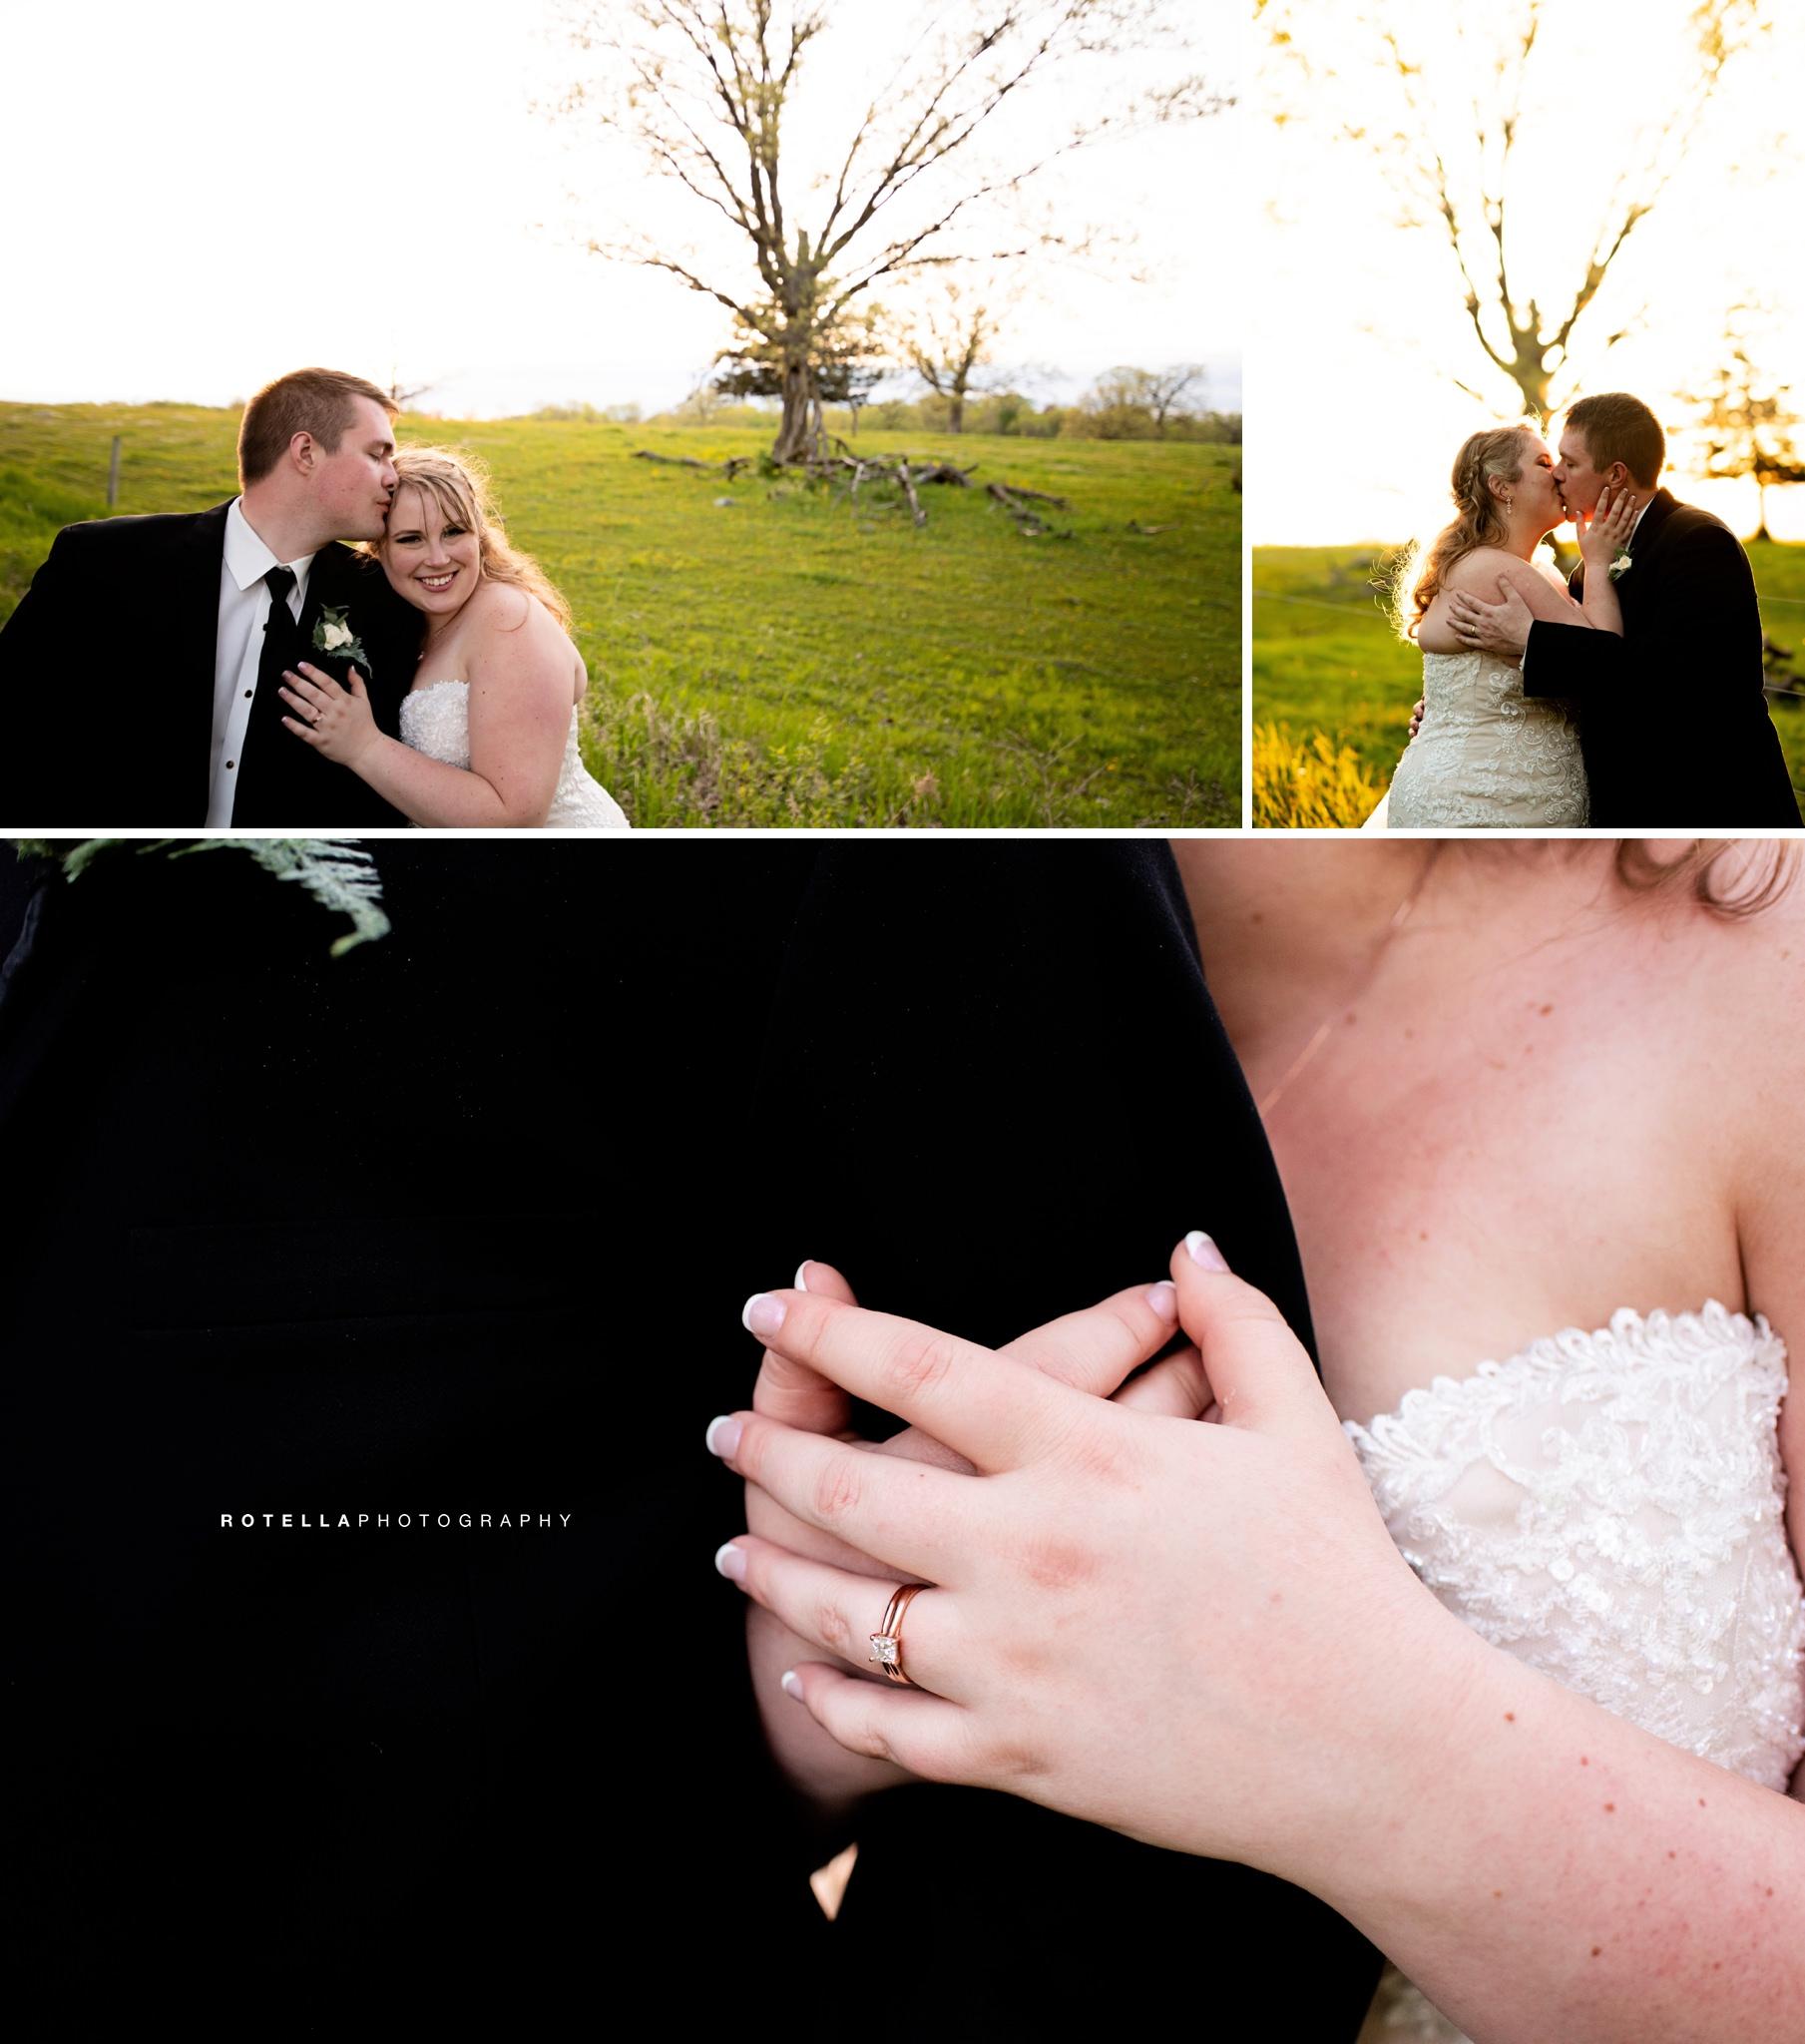 Cassie-Corbin-Wedding-05-25-2019-Rotella-Photography-PREV-97-974_BLOG.jpg